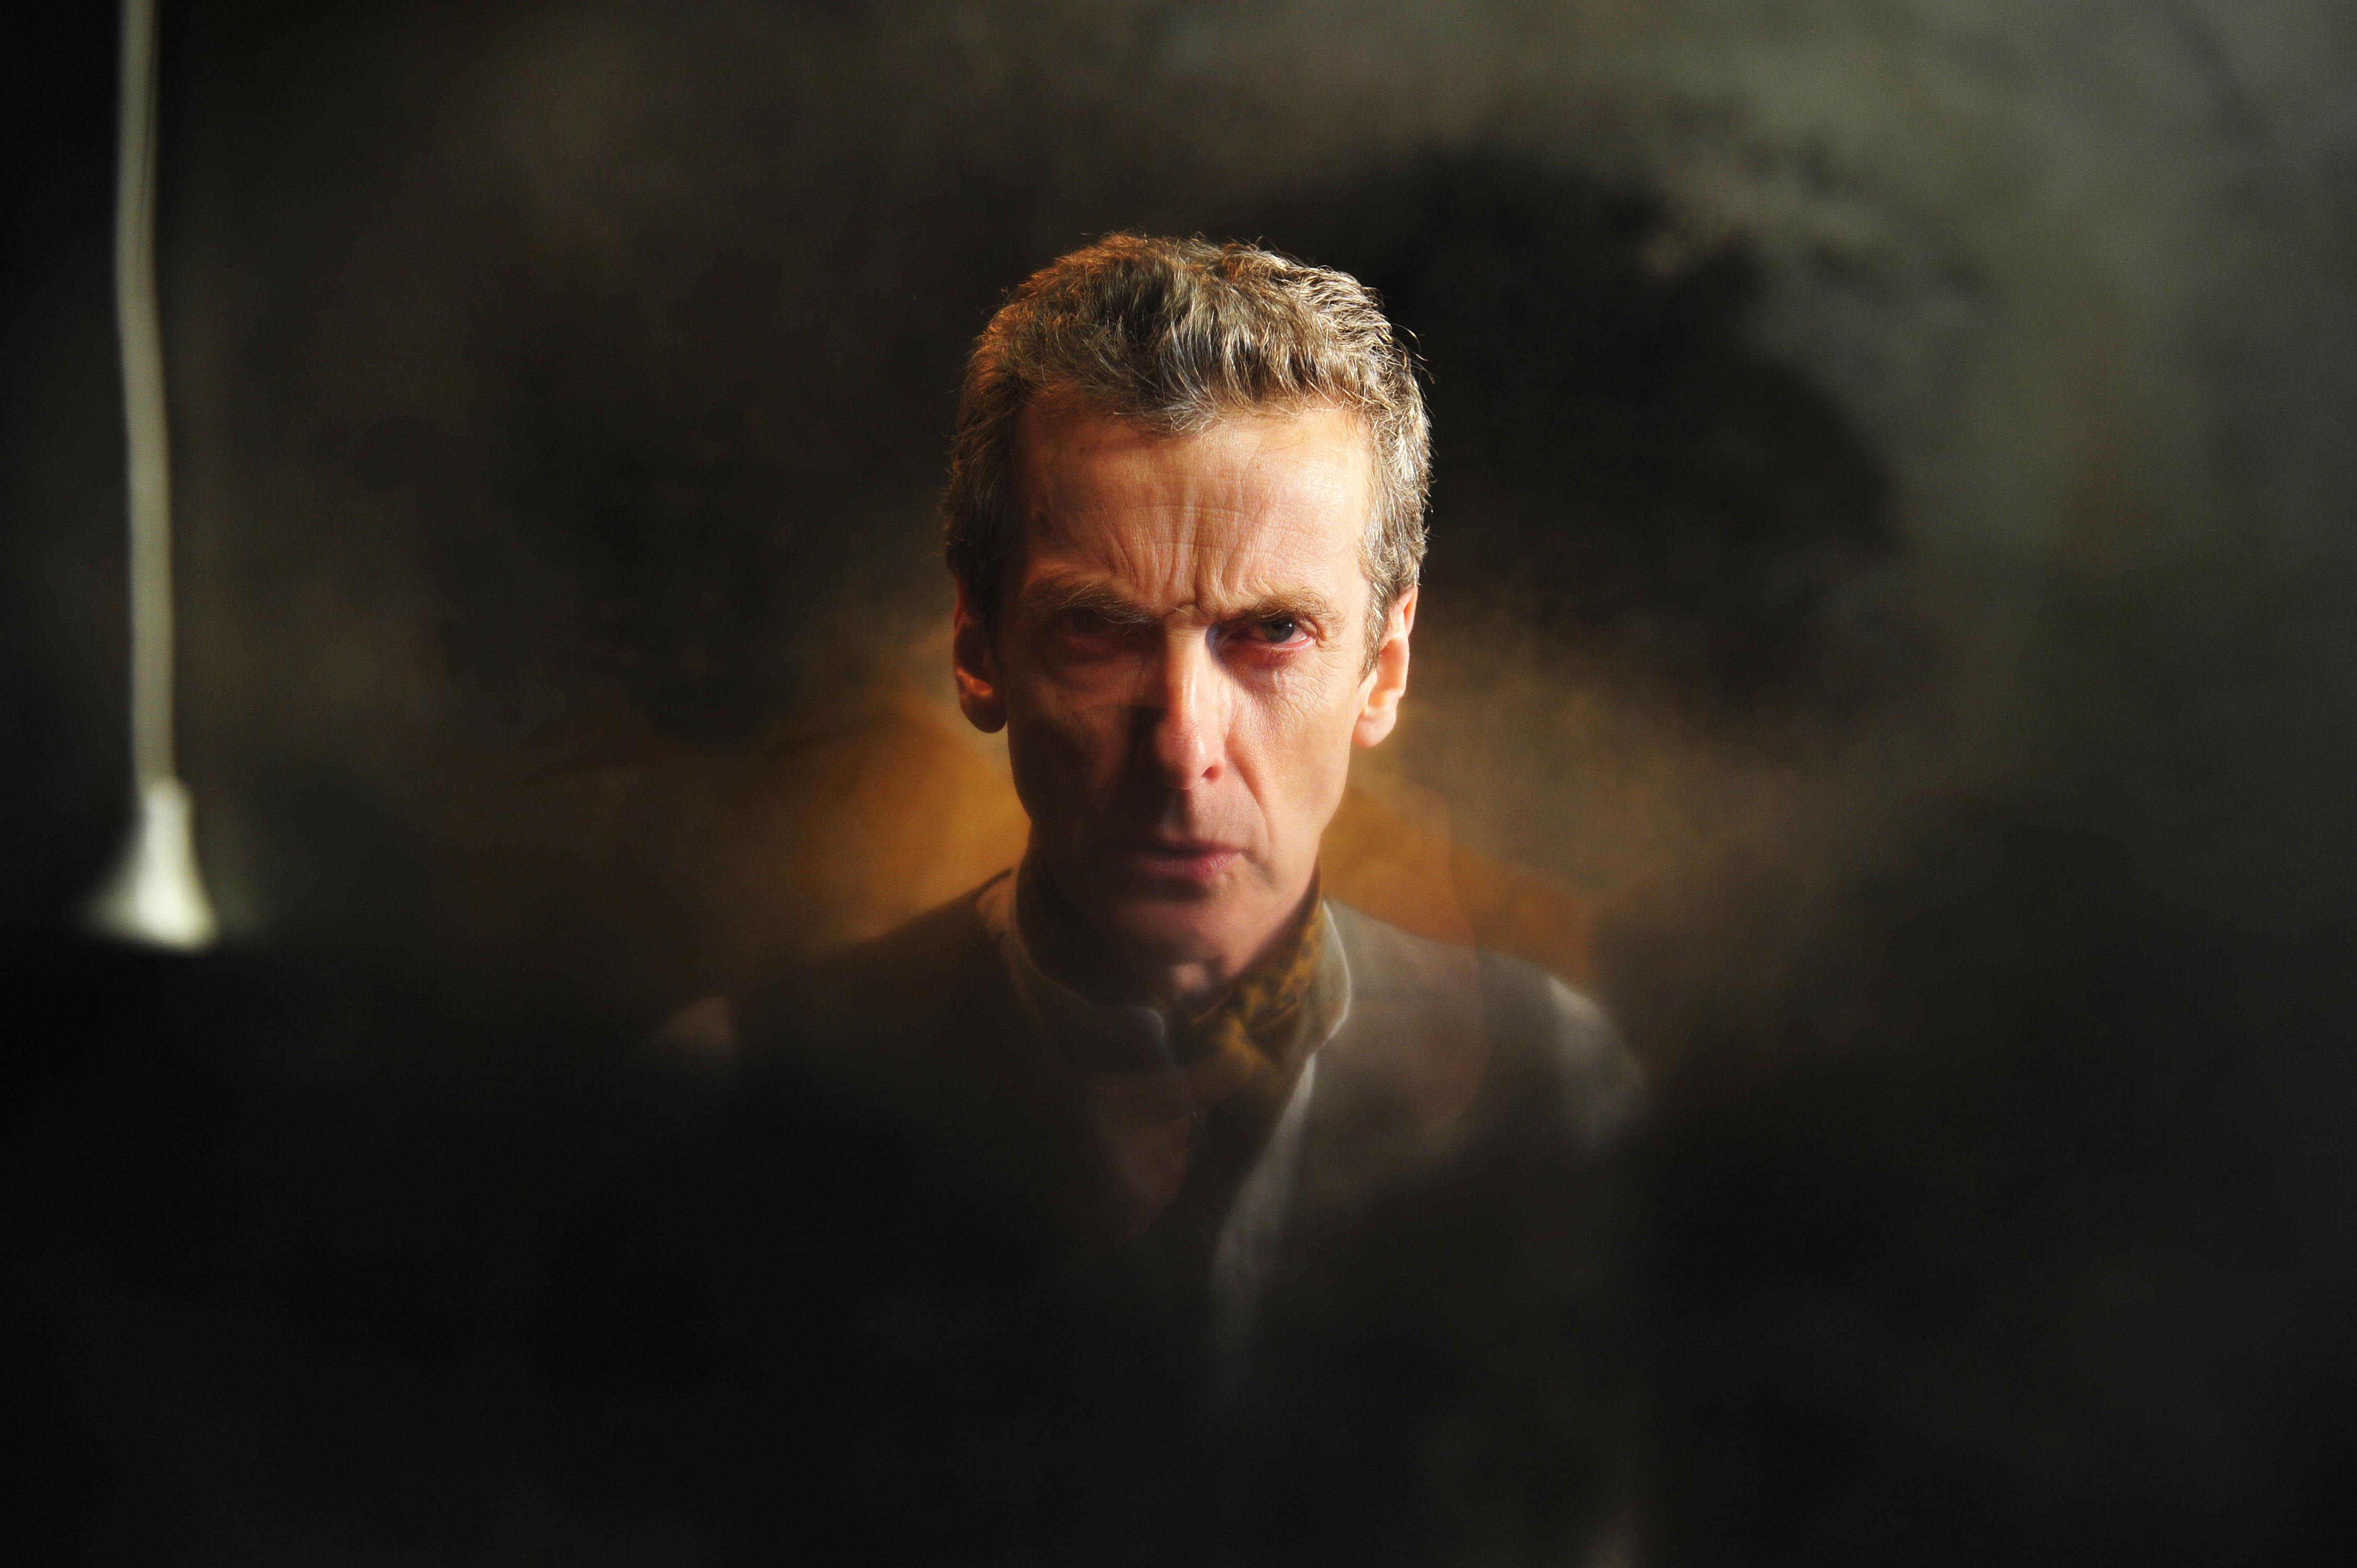 Programma televisivo - doctor who sfondi